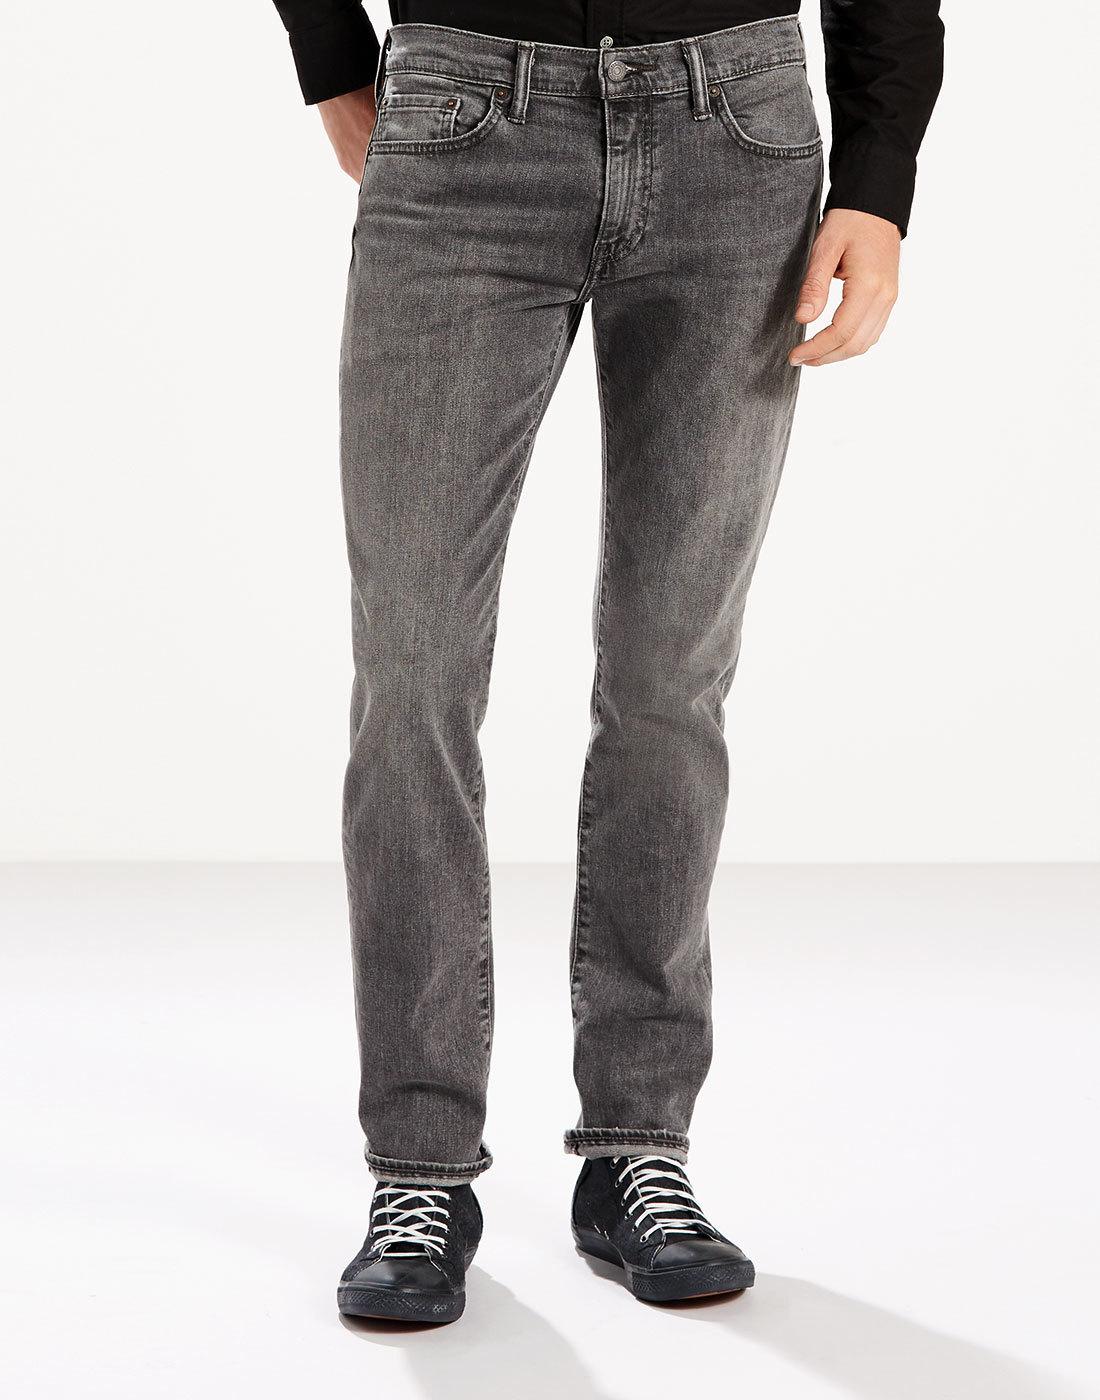 LEVI'S® 511 Retro Slim Grey Denim Jeans BERRY HILL